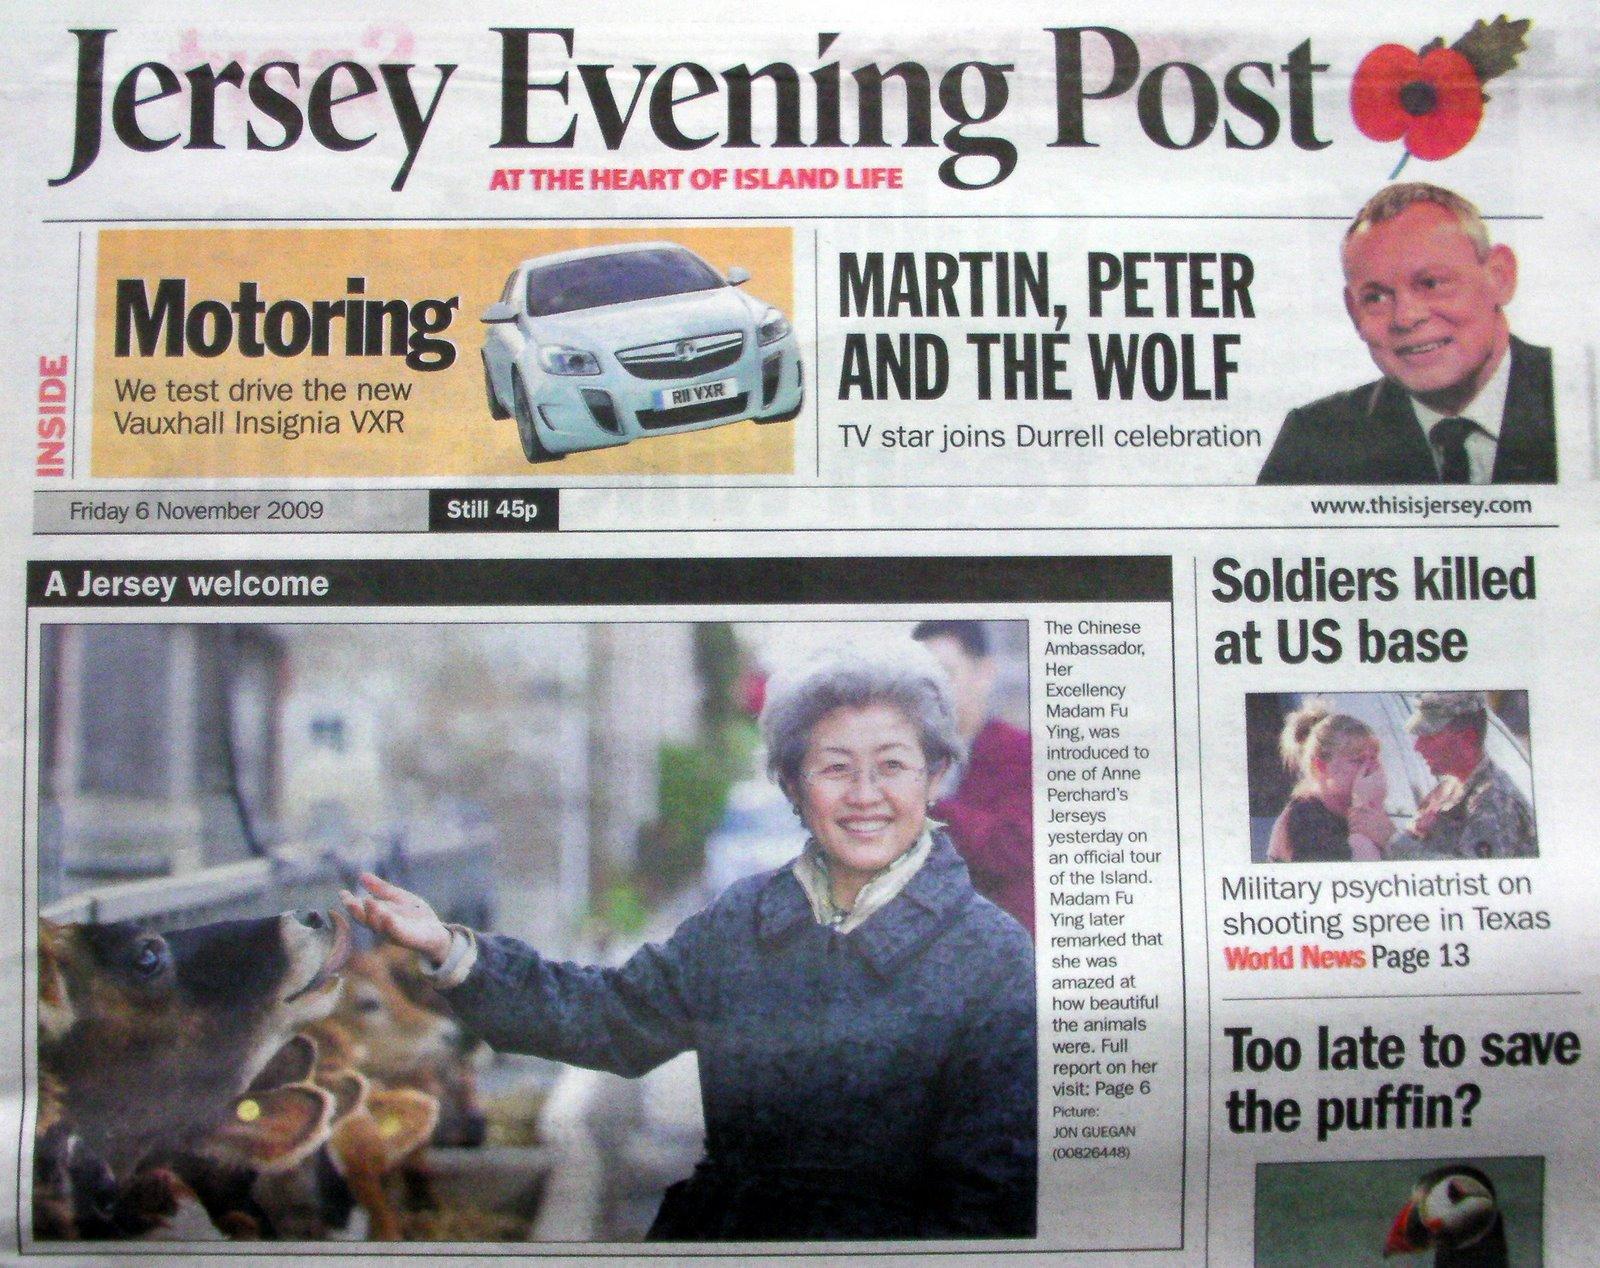 evening post newspaper